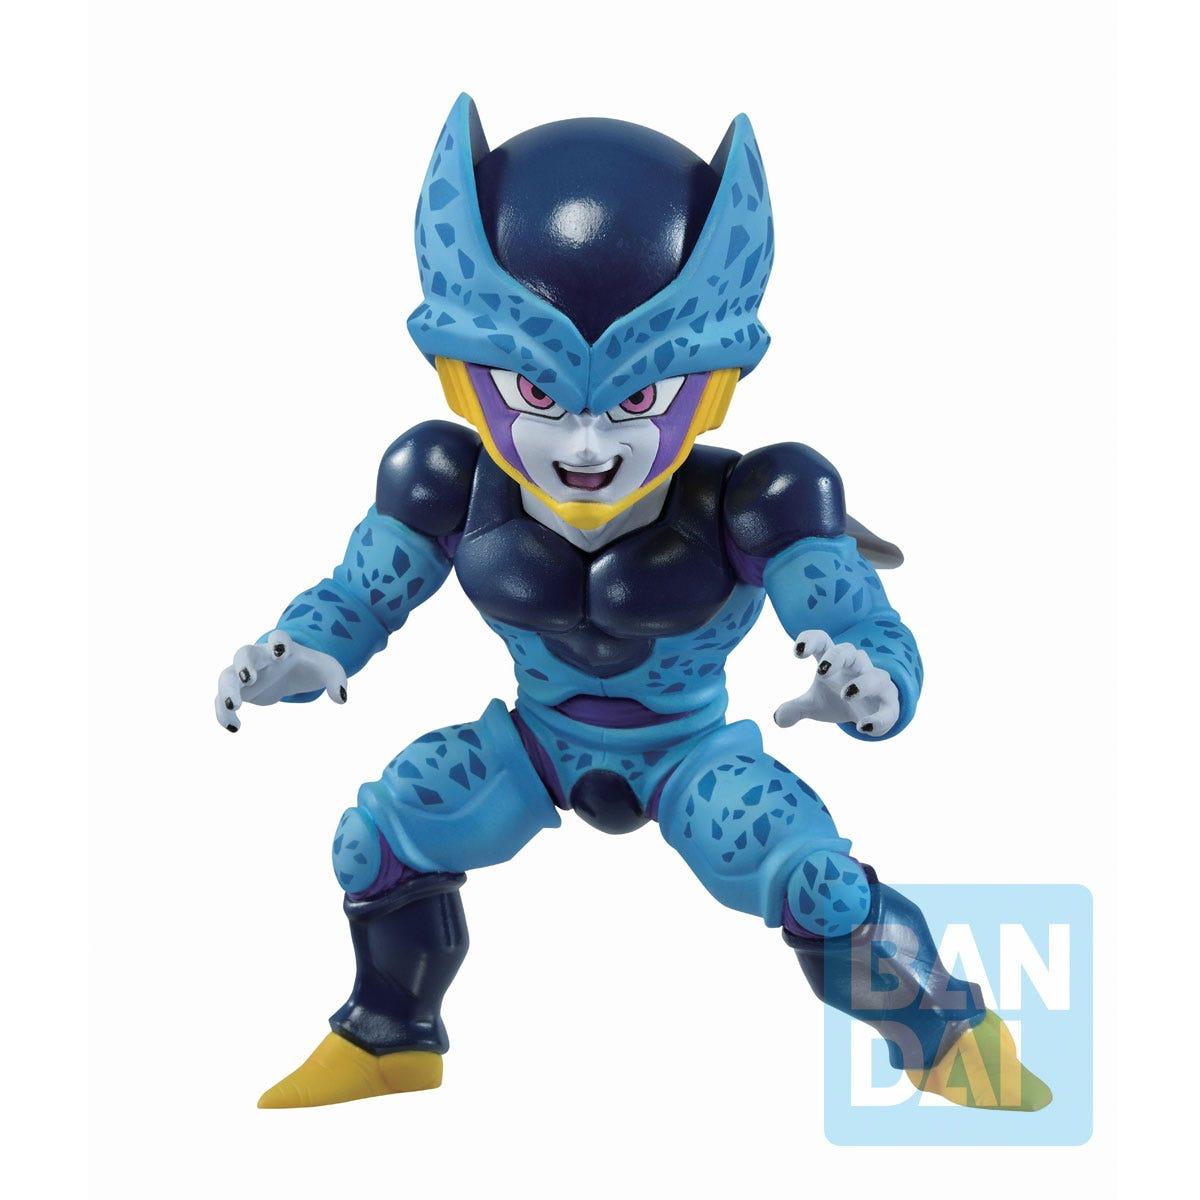 "Bandai Ichibansho Figure Cell JR. (Vs Omnibus Super) ""Dragon Ball Z"""